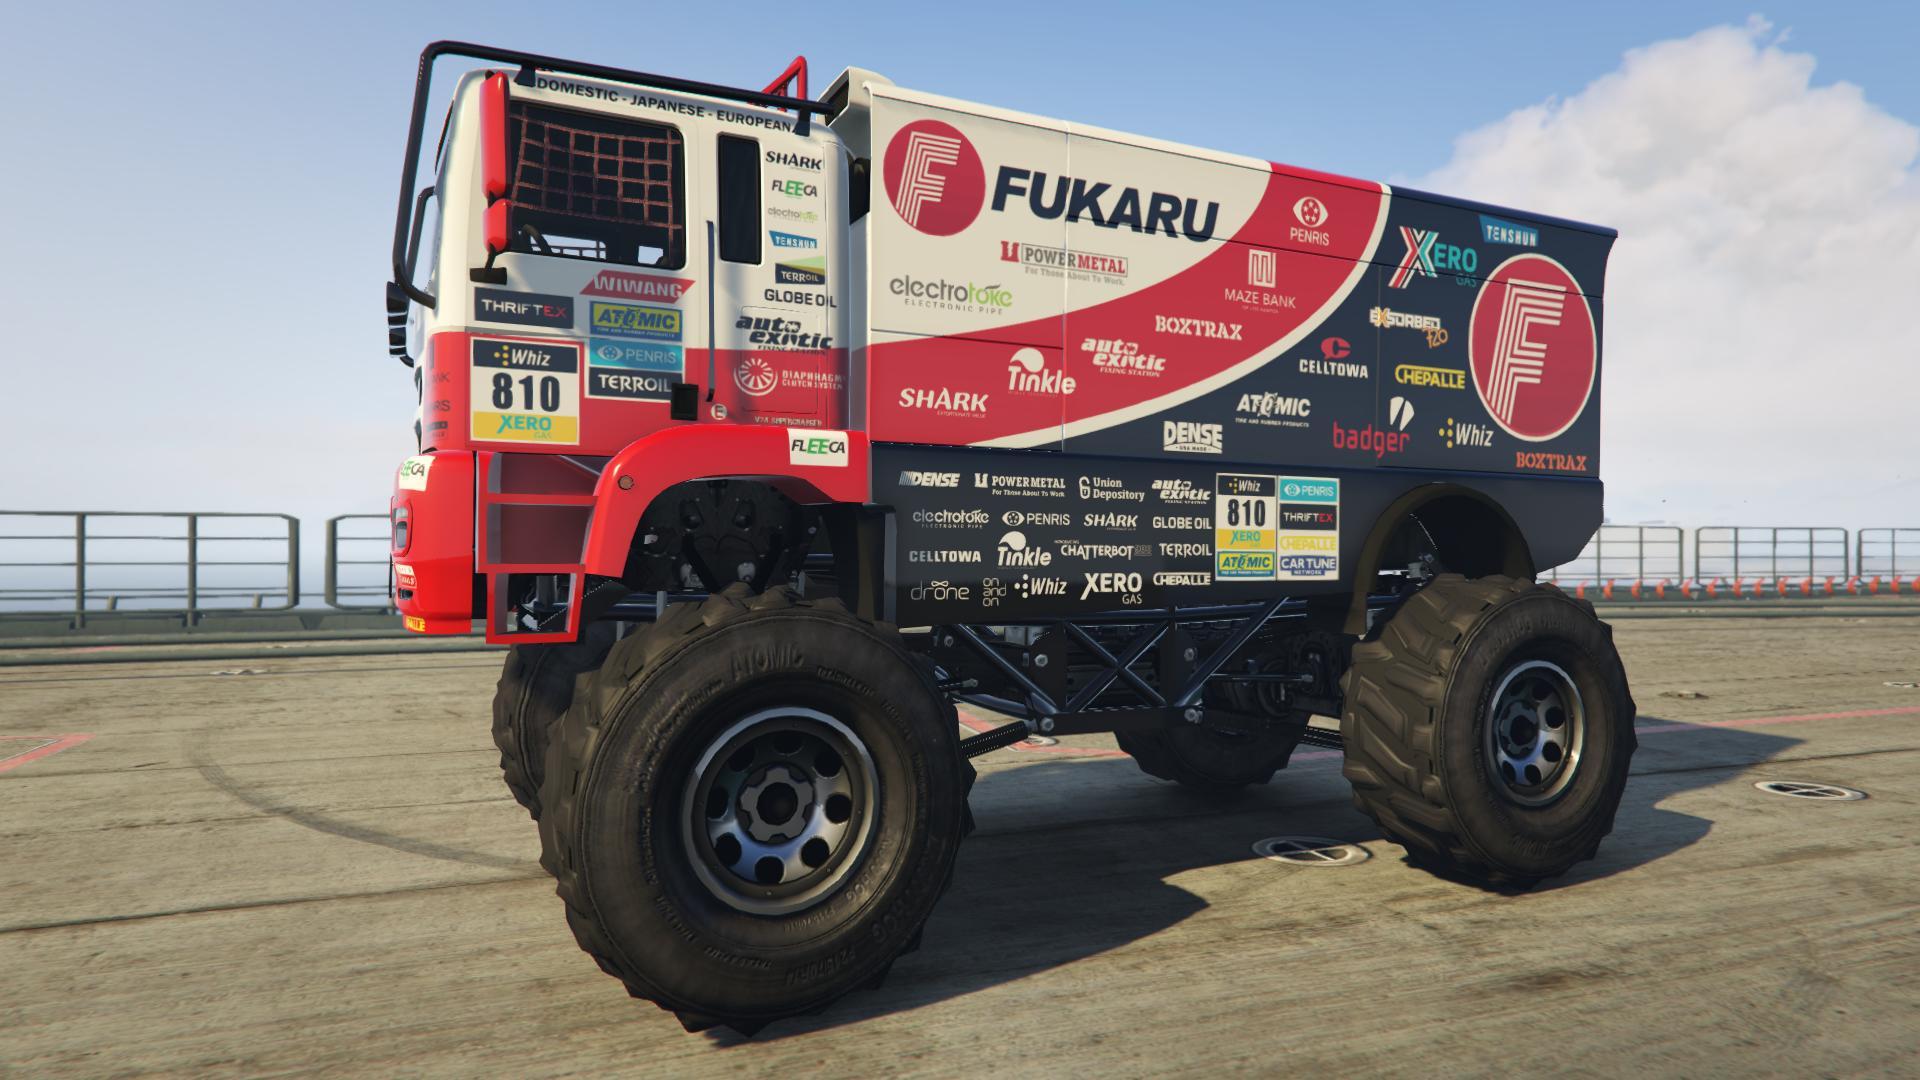 A Truck: Gta 5 Cheats For A Truck